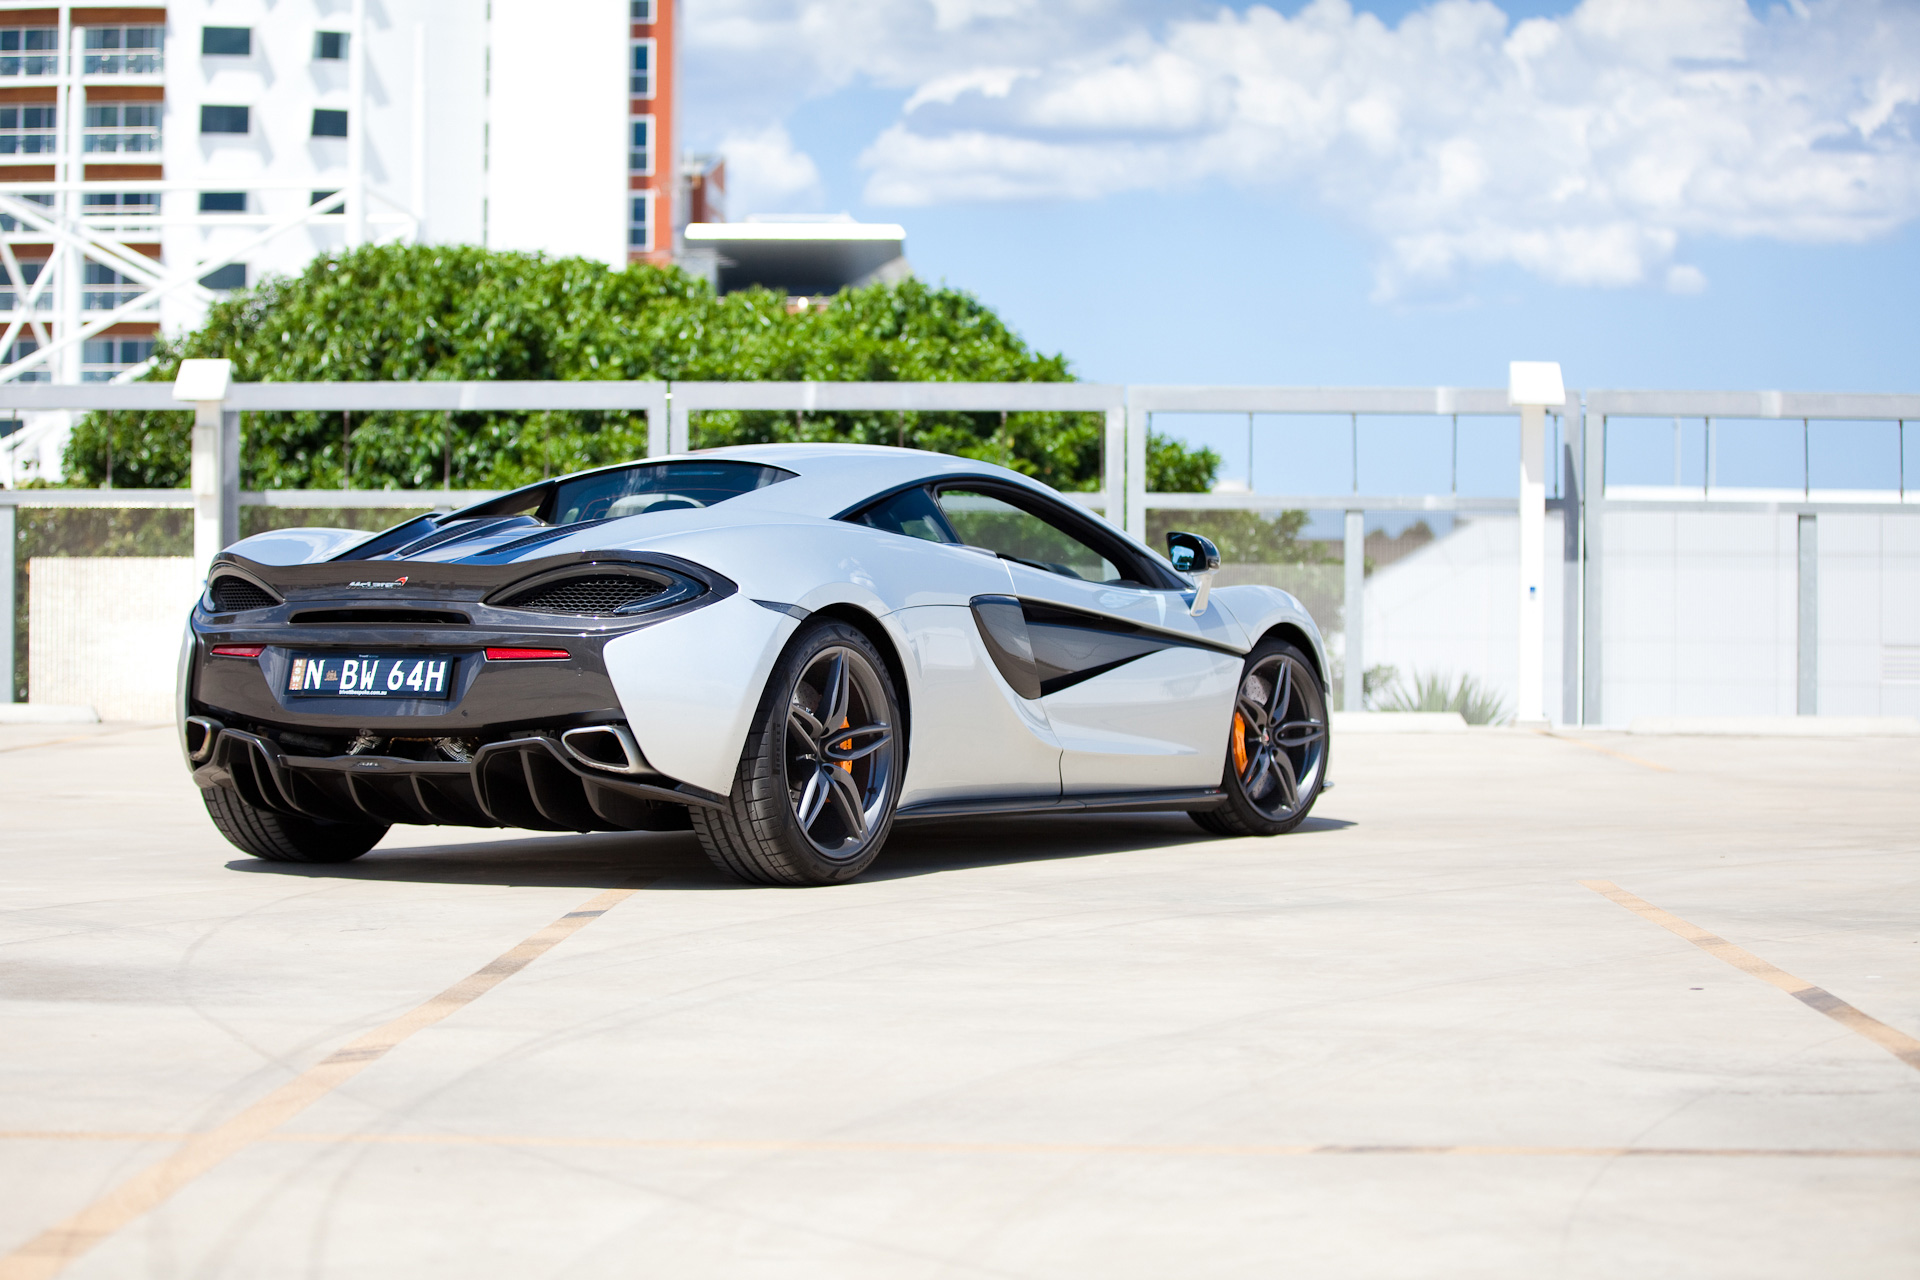 mclaren-570s-rear-profile